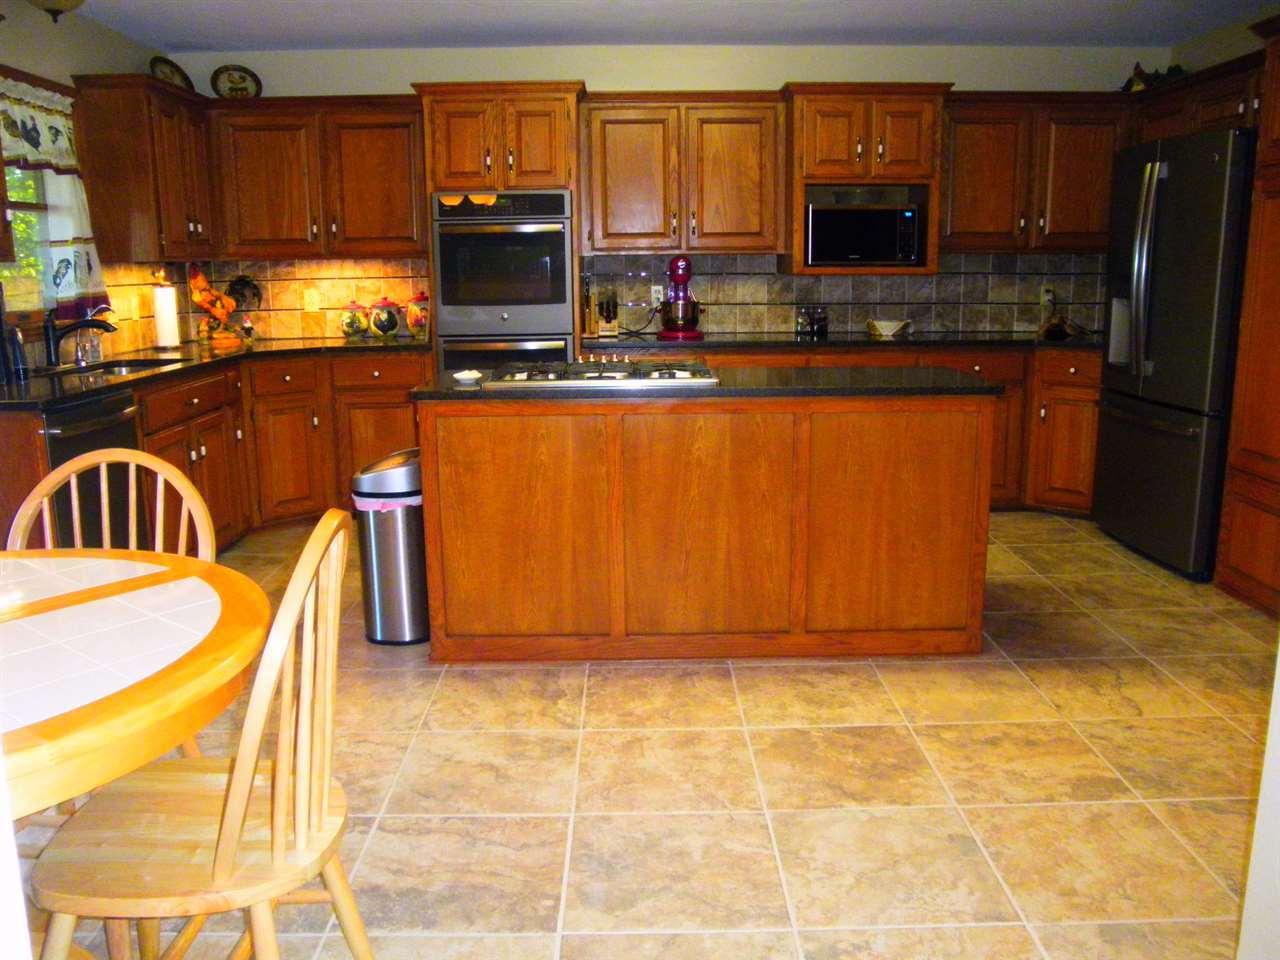 Sold Cross Sale W/ MLS | 32 Raintree Ponca City, OK 74604 9